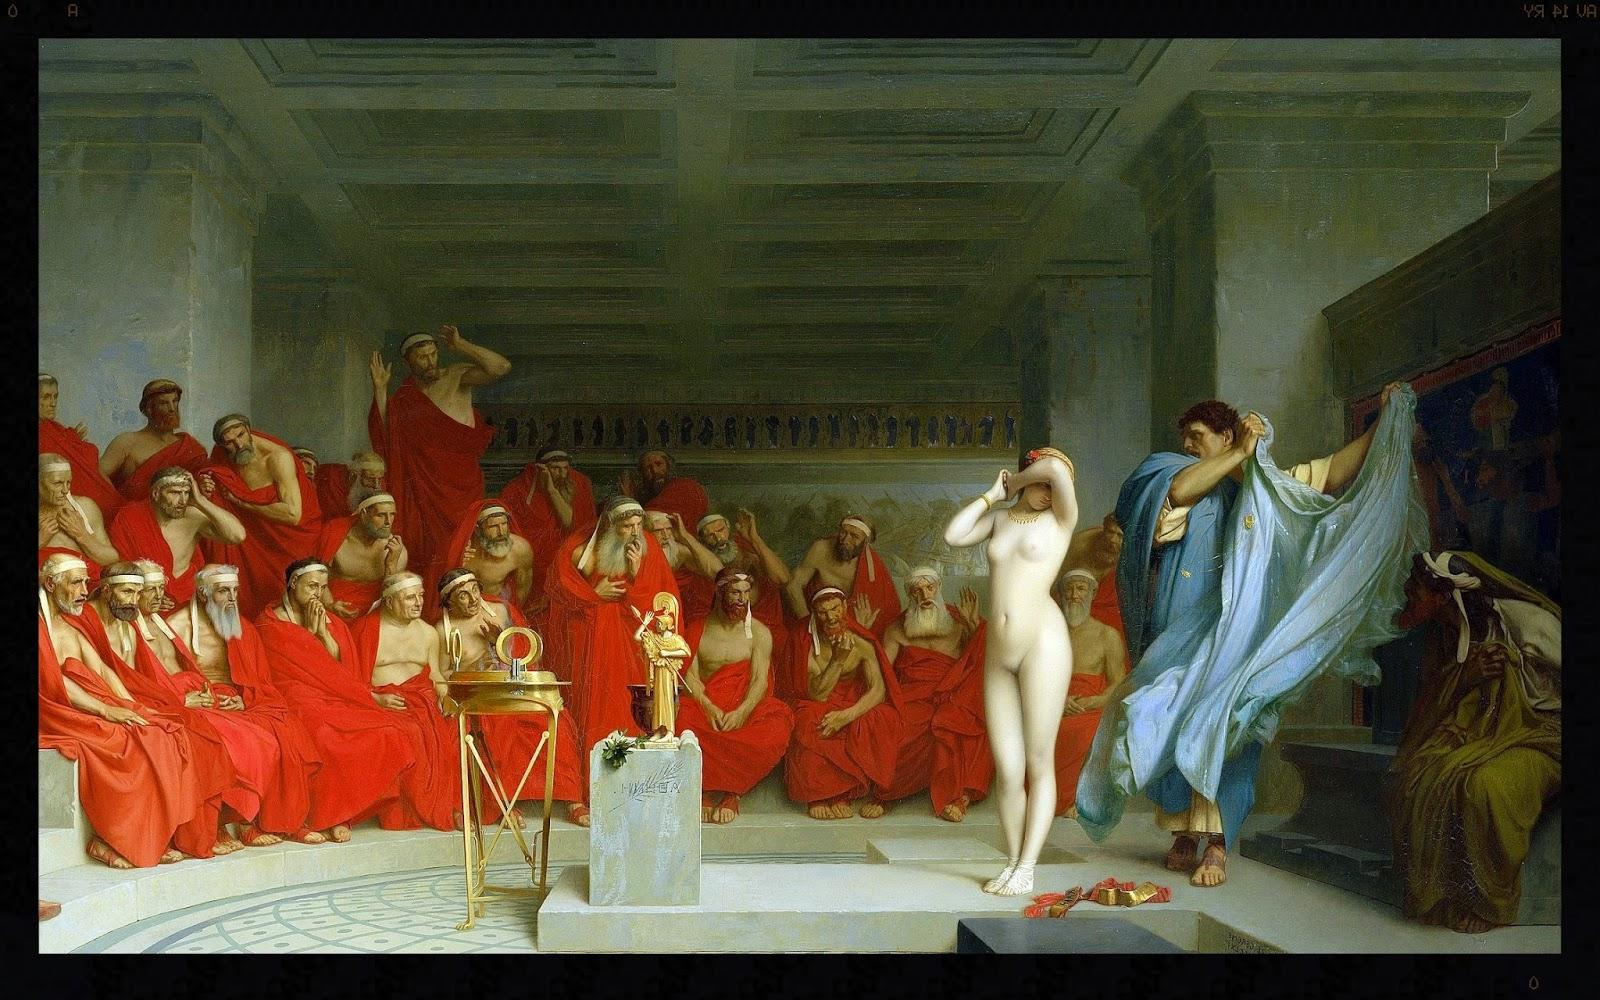 mercado de prostitutas prostitutas famosas de la historia